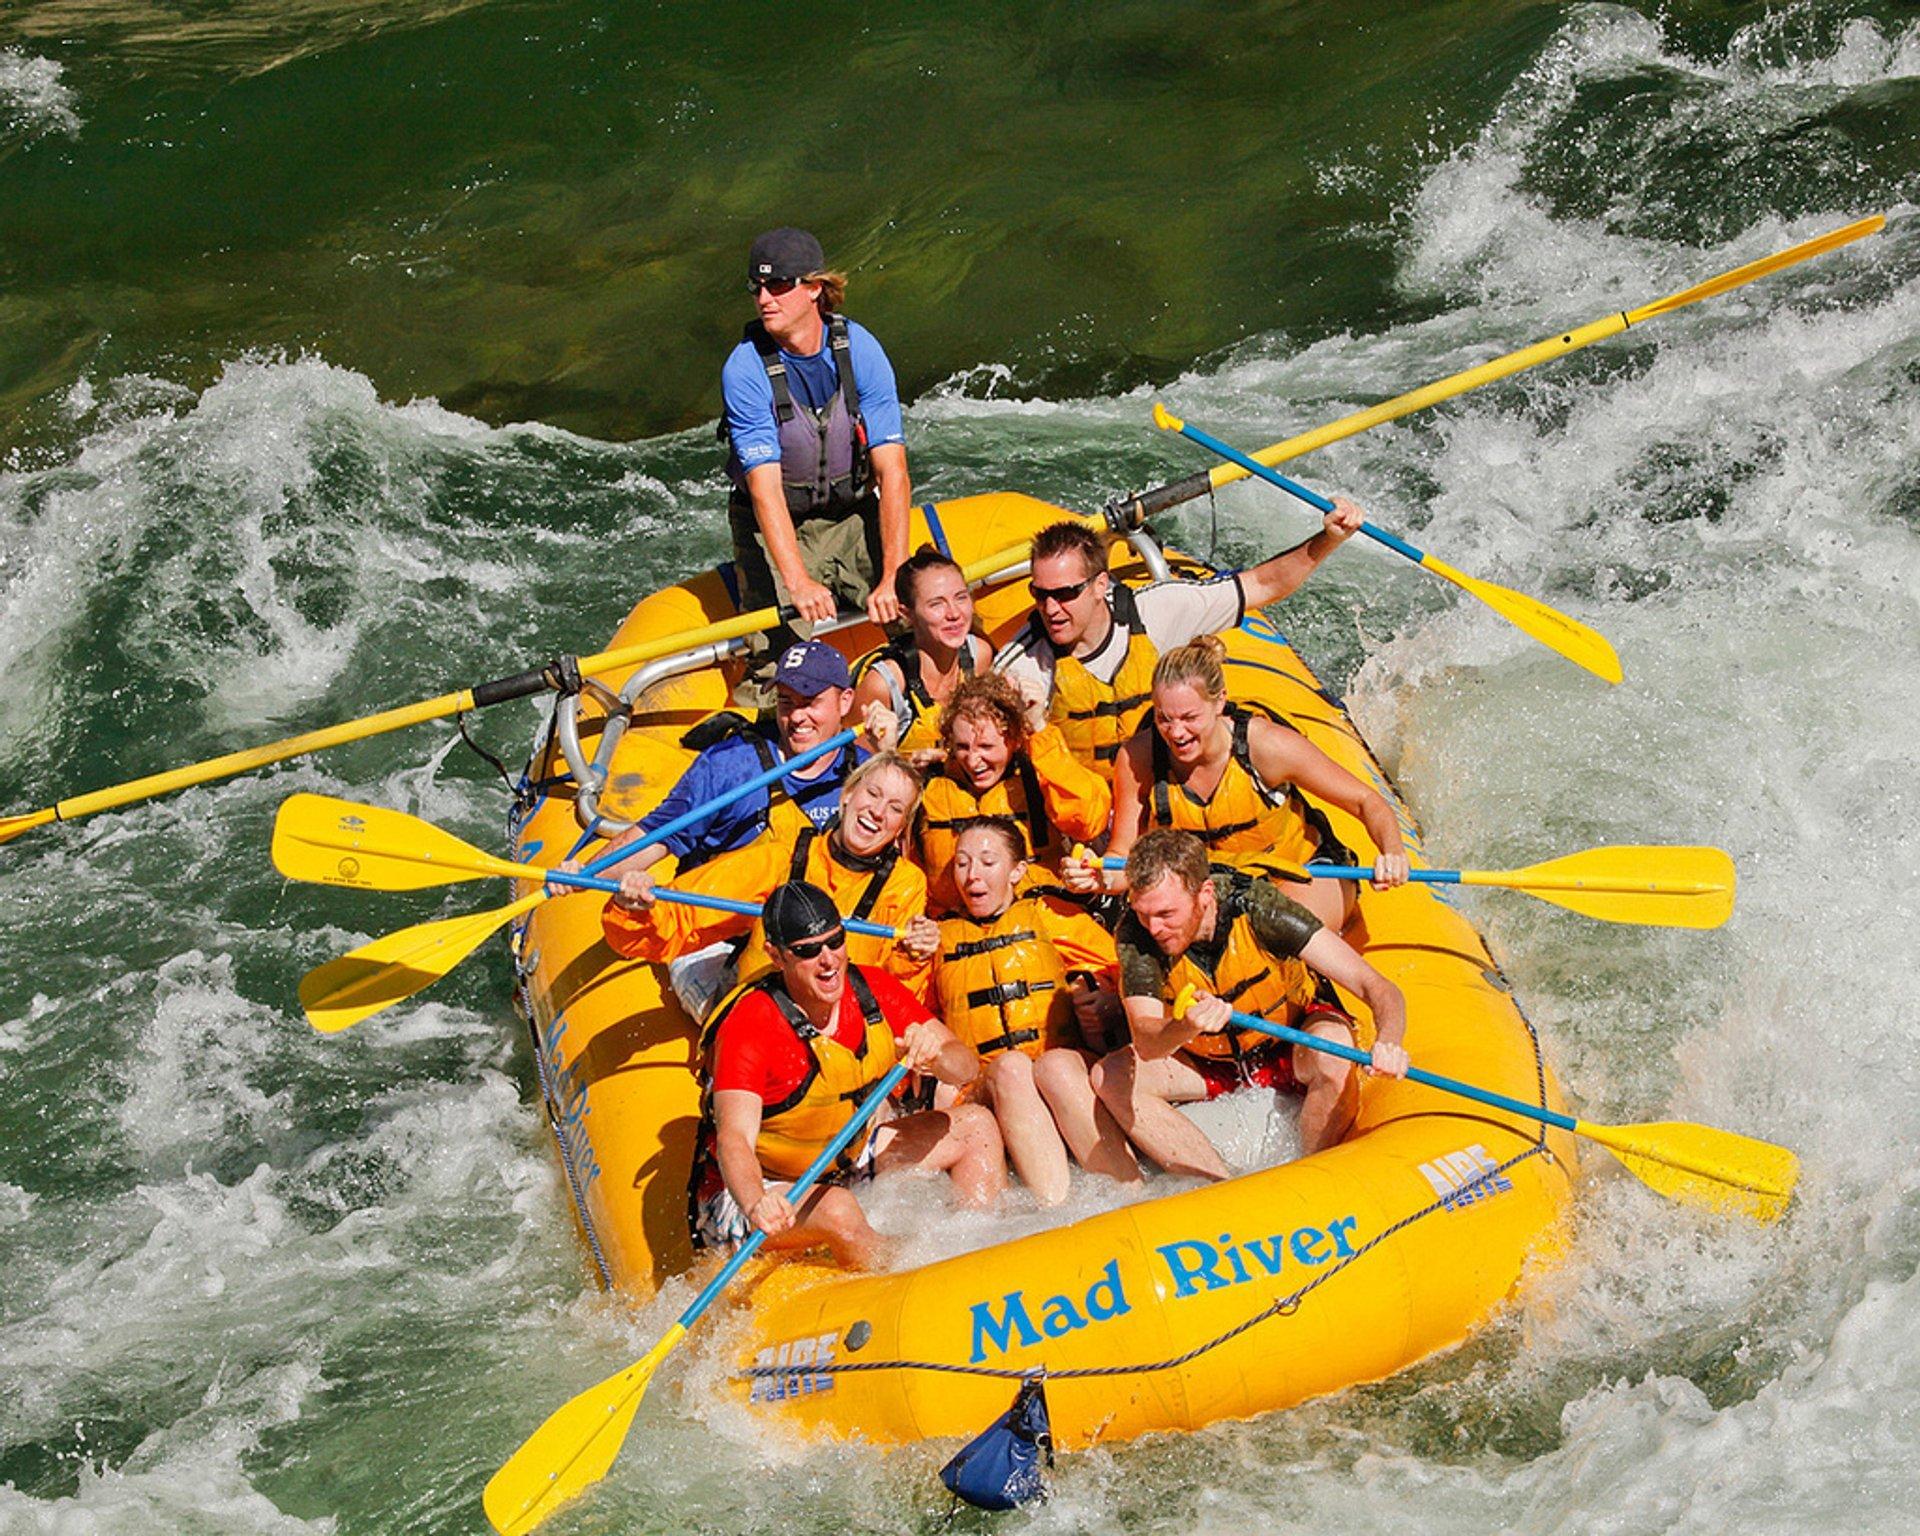 Rafting in Yellowstone National Park - Best Season 2019